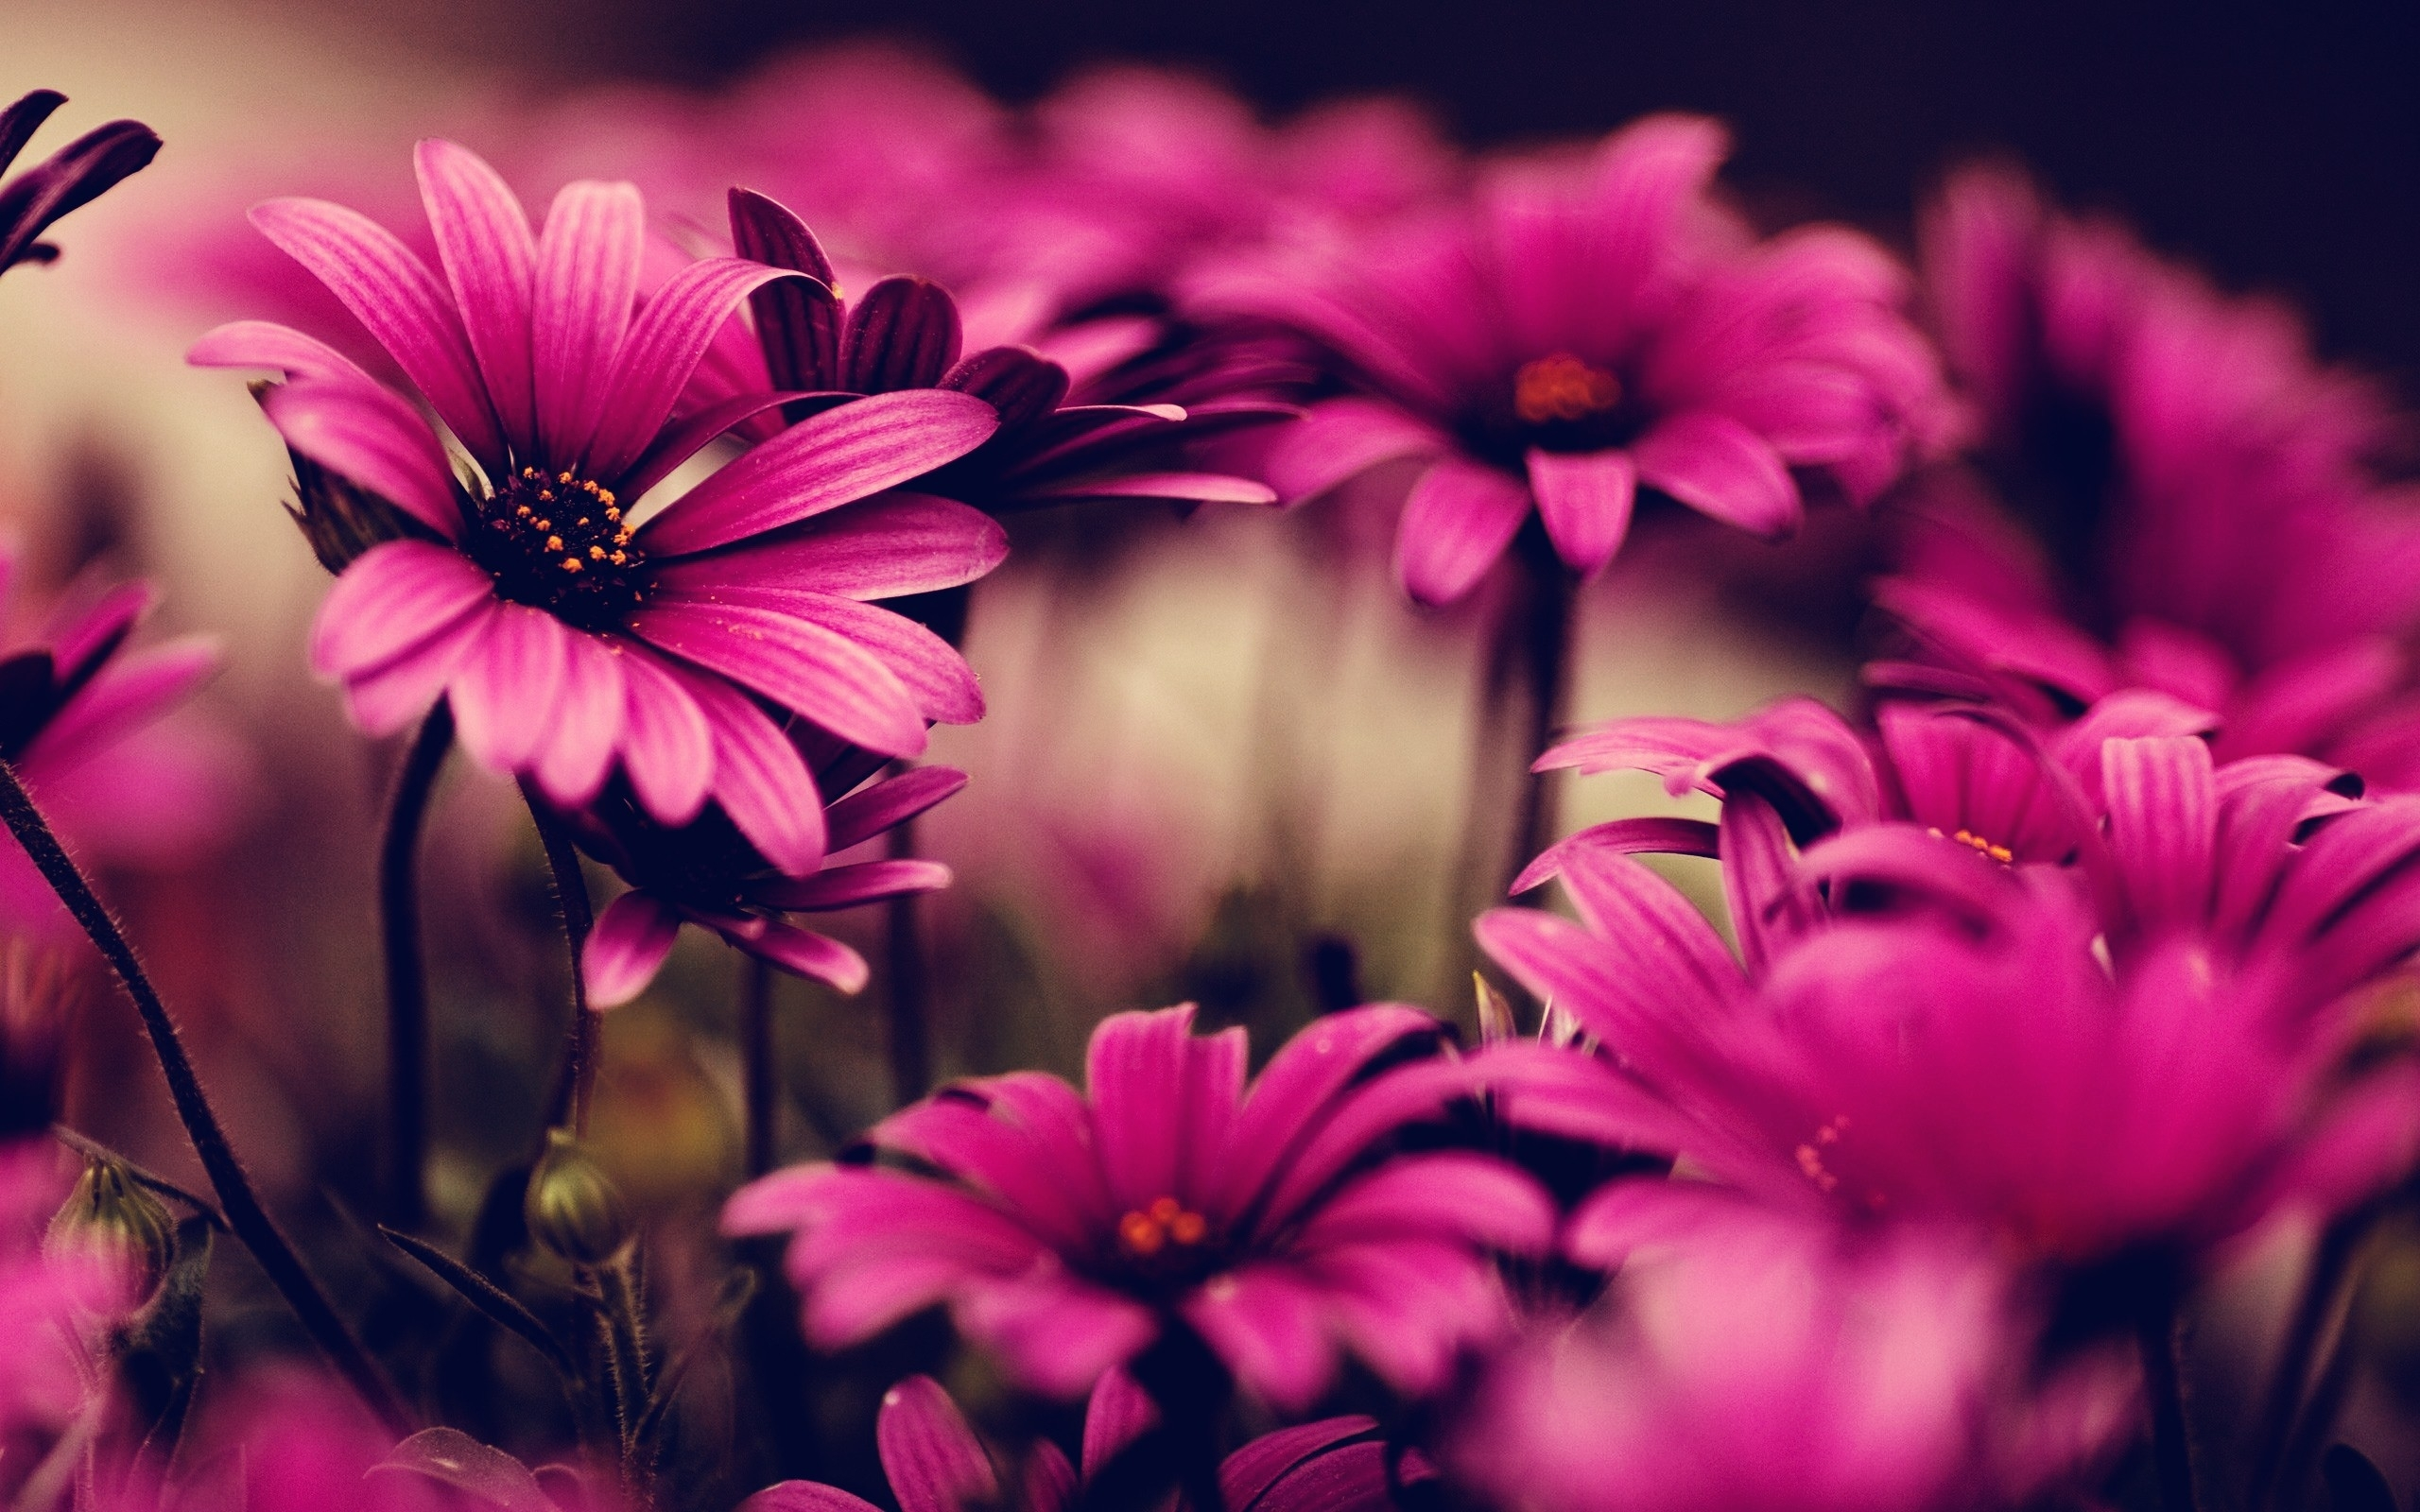 10 New Hd Desktop Backgrounds Flowers Full Hd 1080p For Pc Desktop